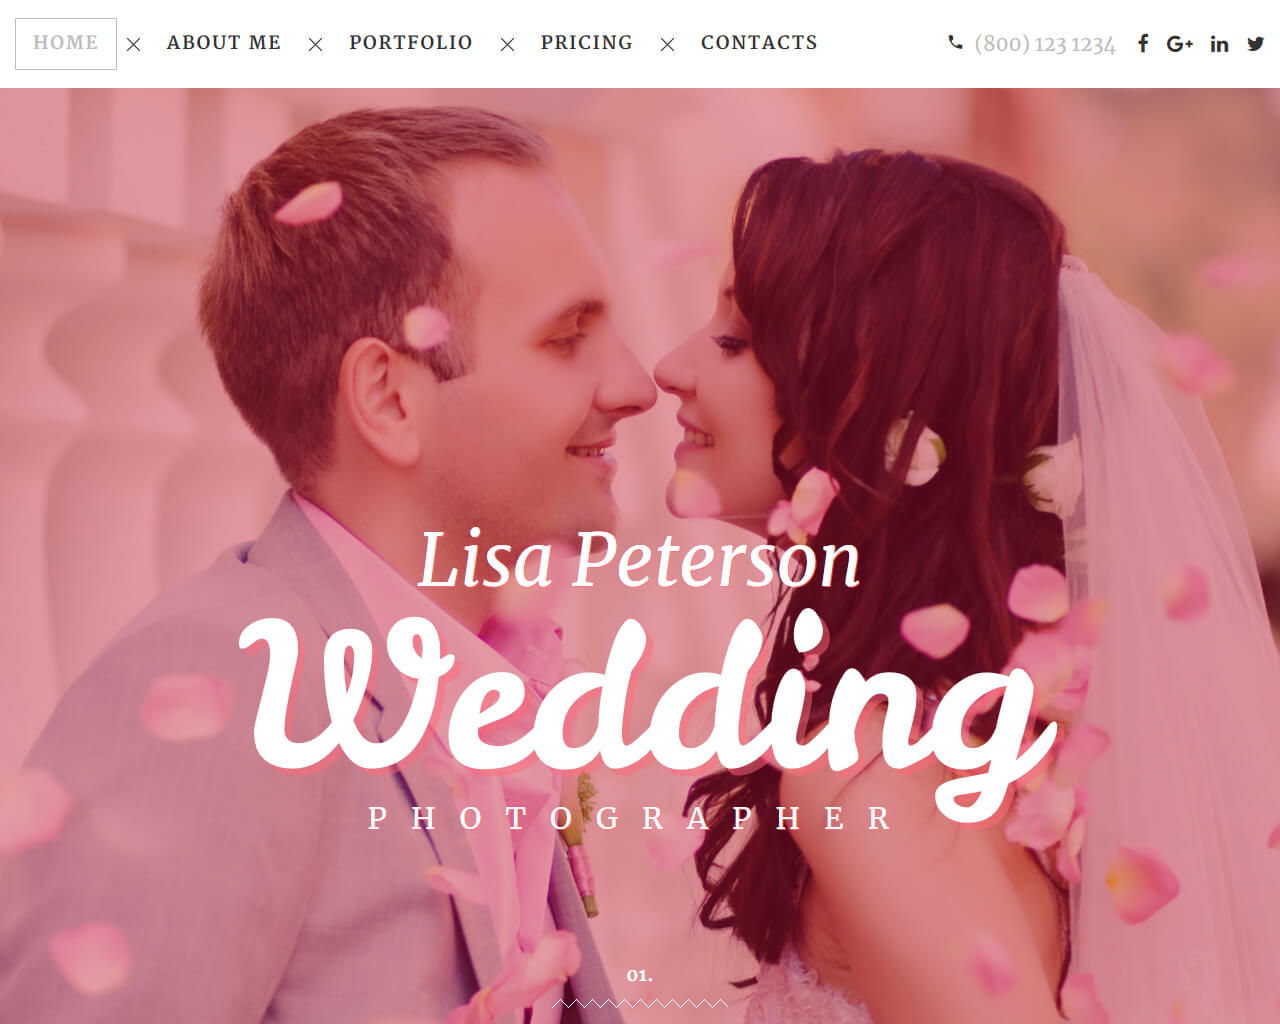 Lisa Peterson Website Template